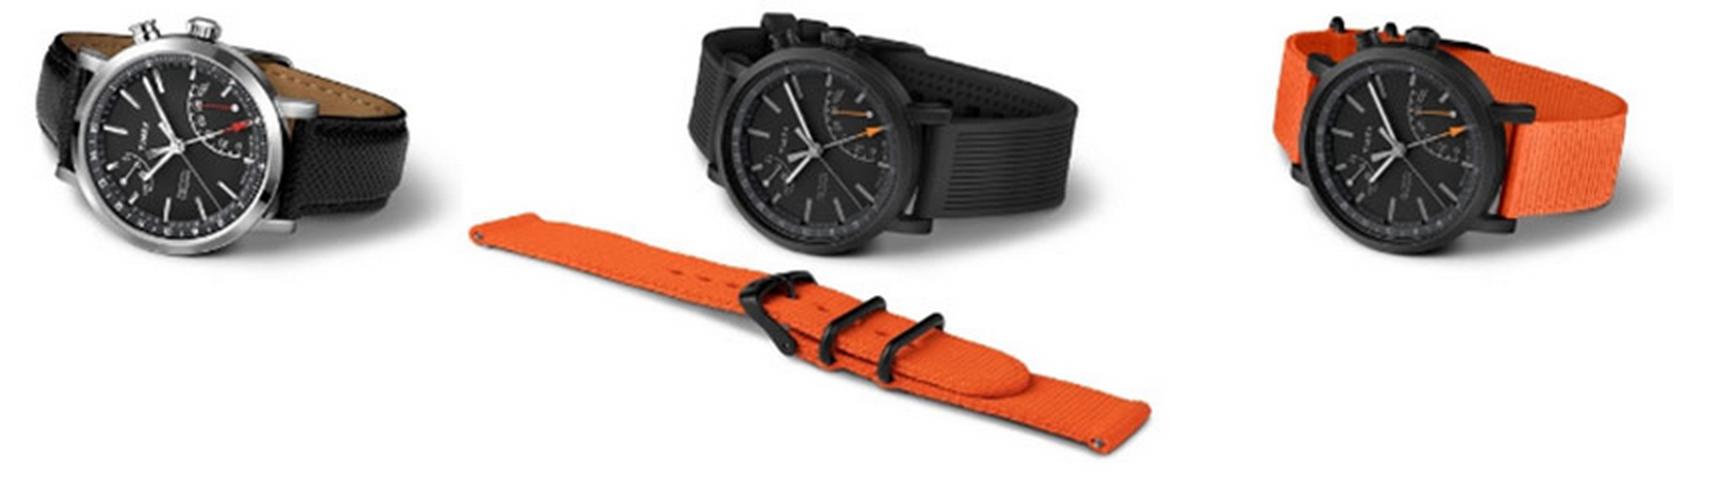 timex-metropolitan-smartwatch